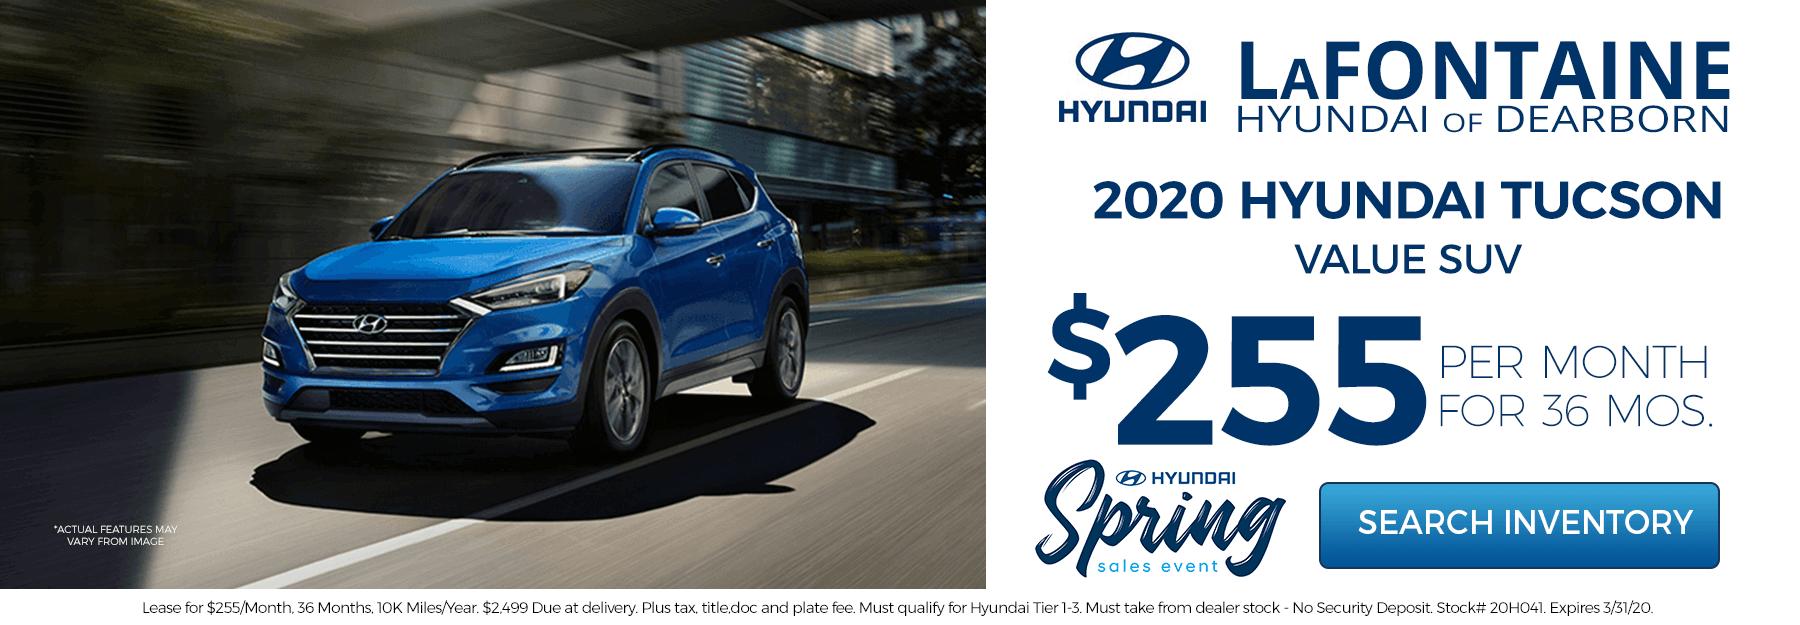 1800x625 HyundaiBanner NEW Tucson